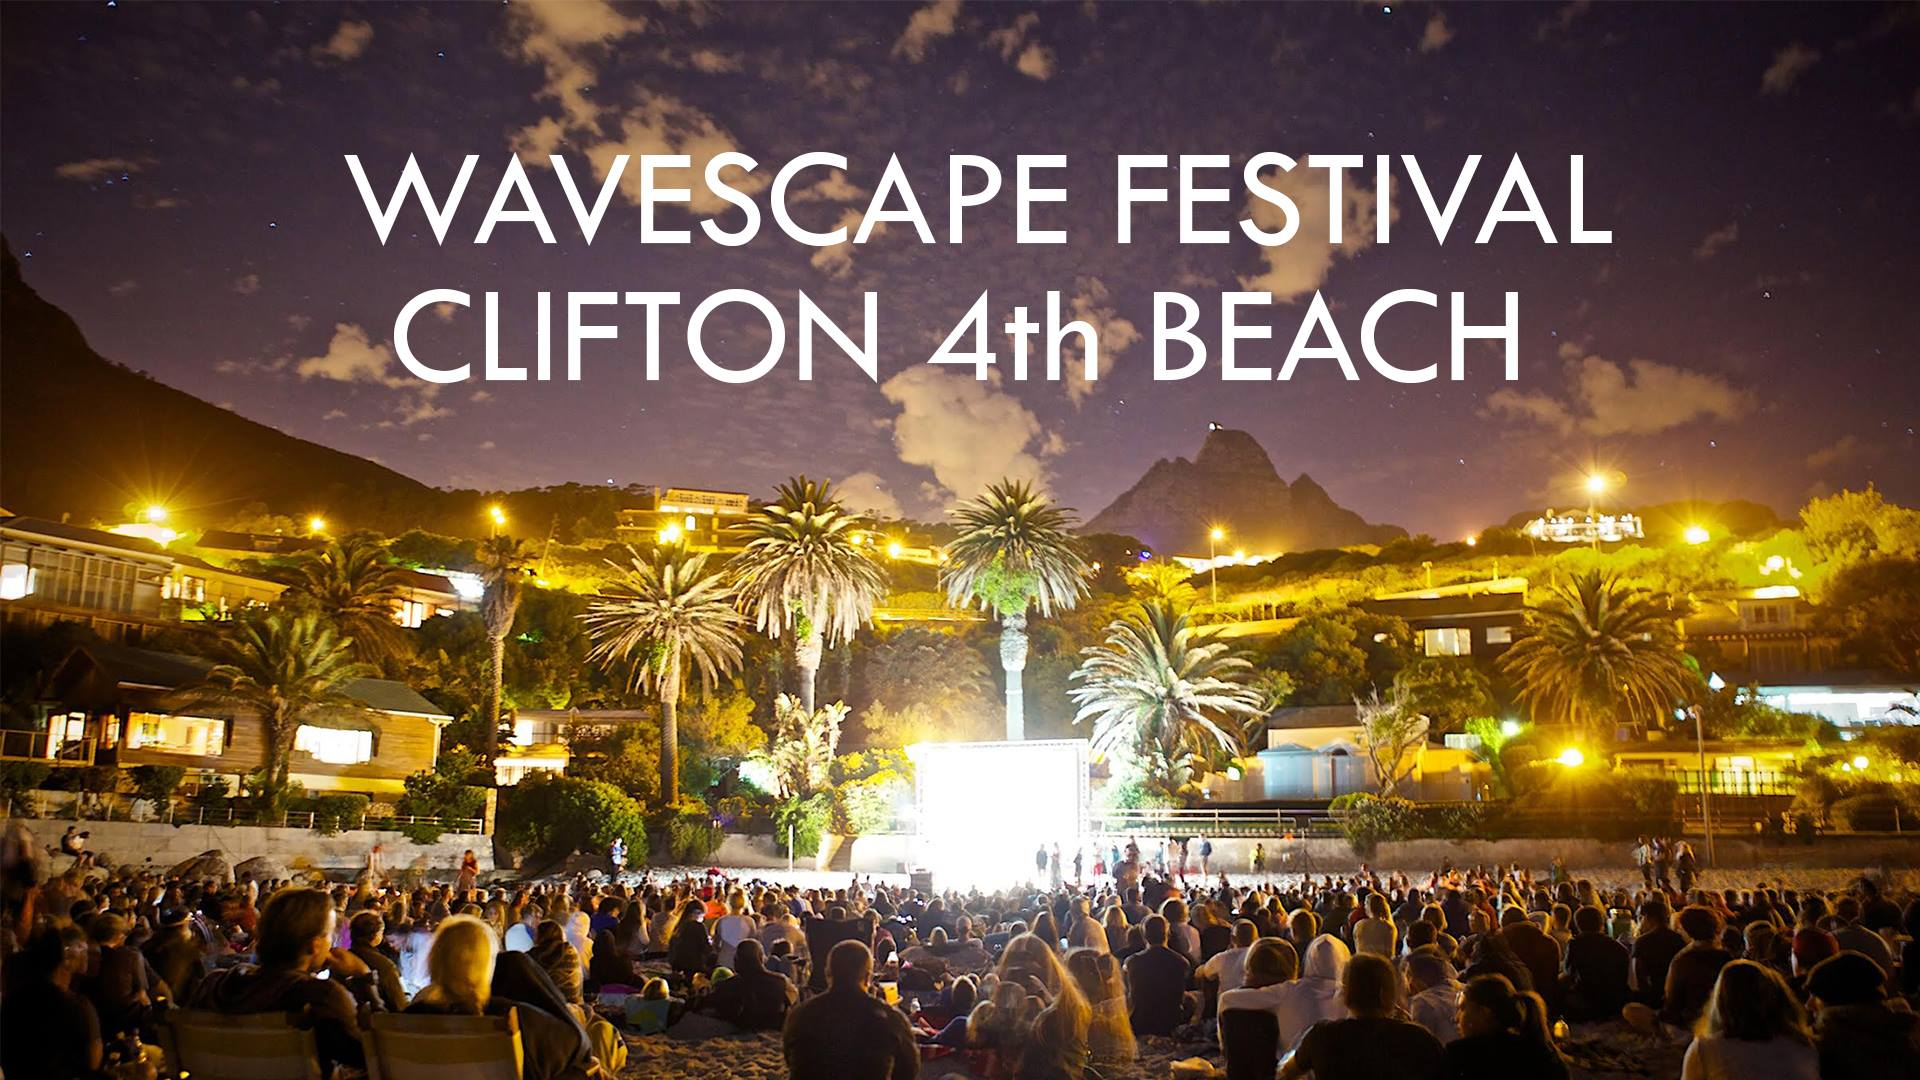 Wavescape Festival 2017